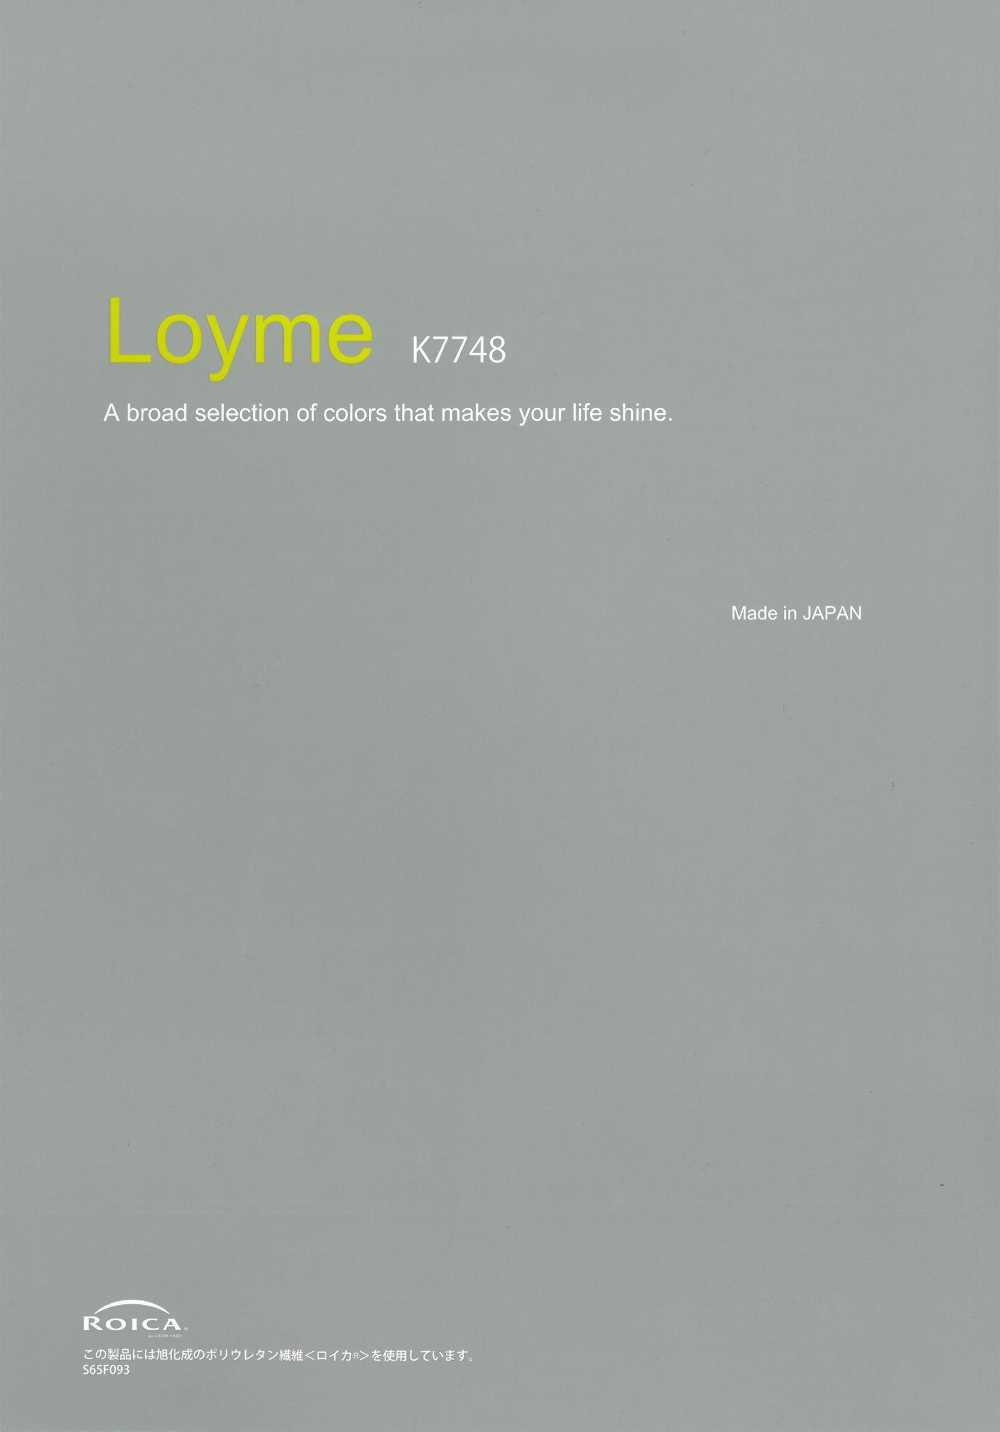 K7748 Loyme ポリエステルカチオン 2WAY 無地[生地] フレスデザイン/オークラ商事 - ApparelX アパレル資材卸通販